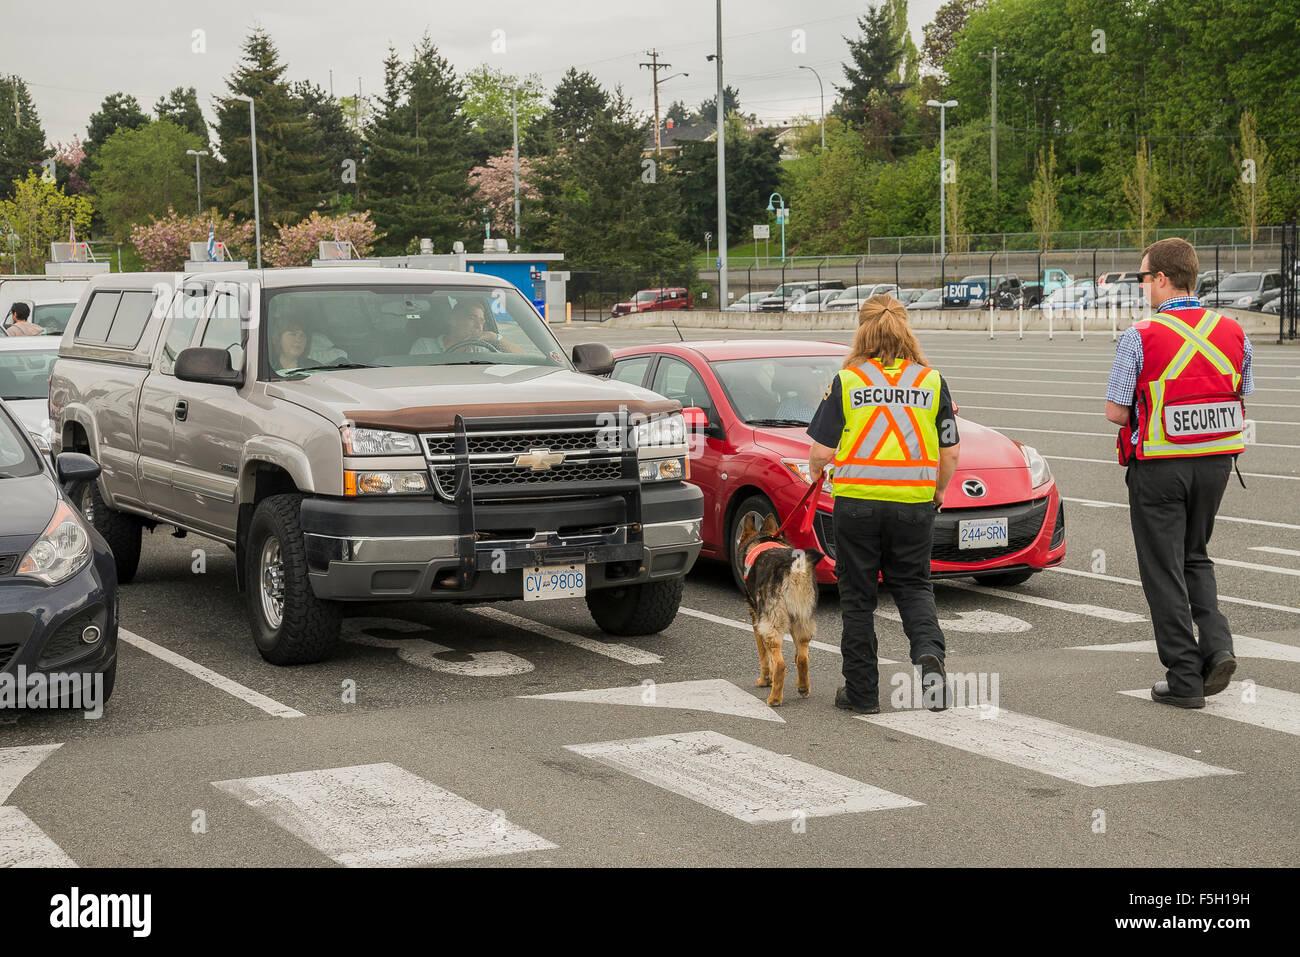 Explosives sniffing dog, Nanaimo Ferry Terminal, Nanaimo, British Columbia, Canada - Stock Image